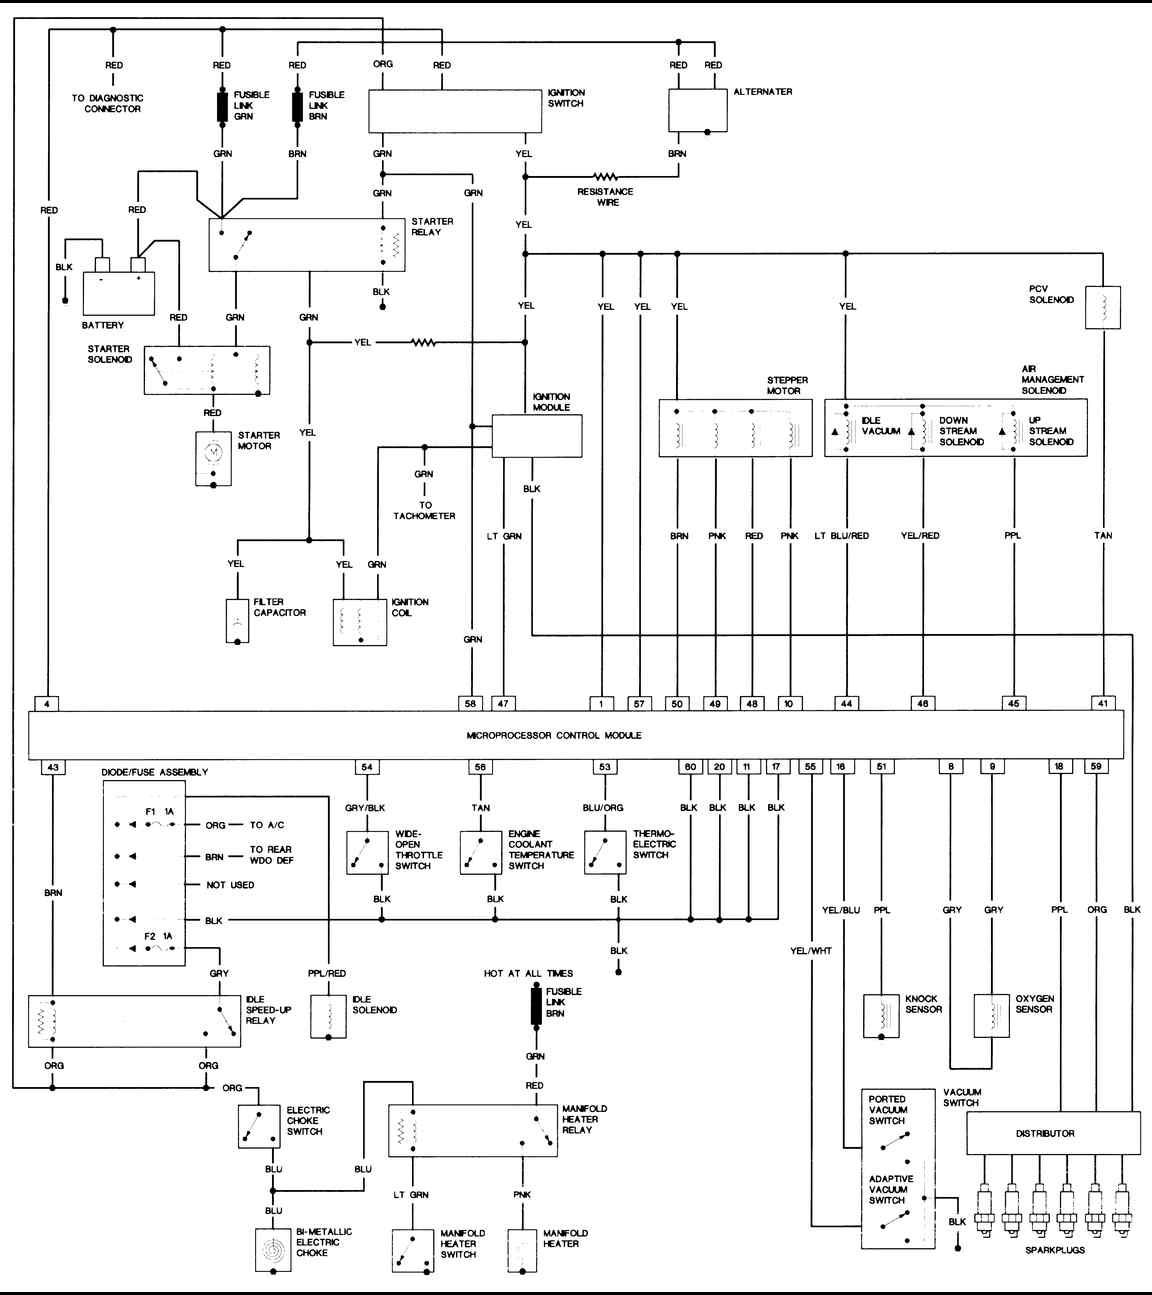 Free Jeep Wiring Diagrams - Wiring Diagram - Jeep Wrangler Wiring Diagram